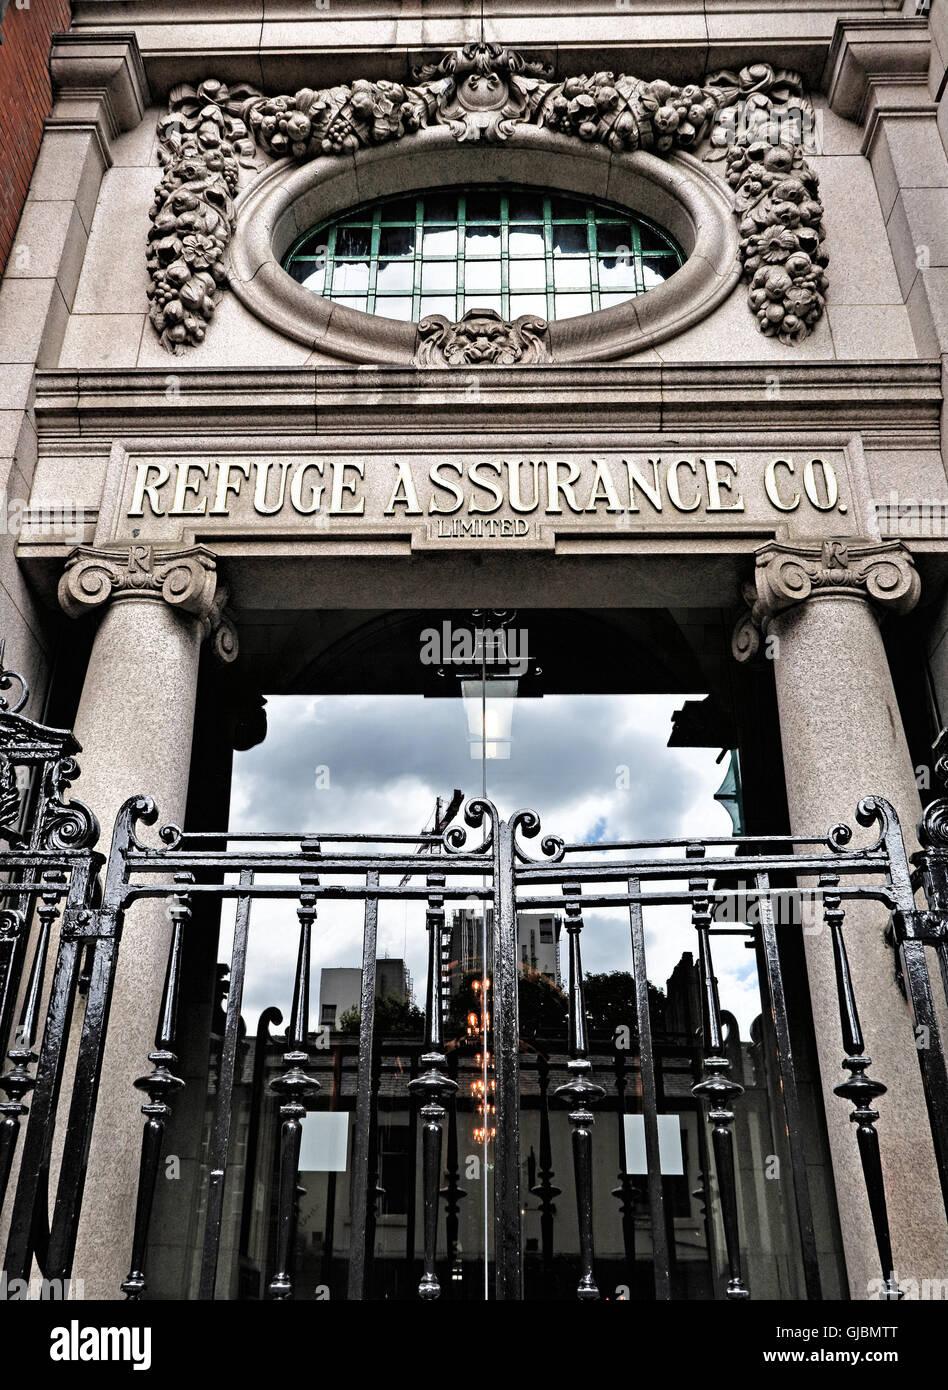 Laden Sie dieses Alamy Stockfoto Refuge Assurance Bürogebäude, Oxford Road Manchester, - GJBMTT